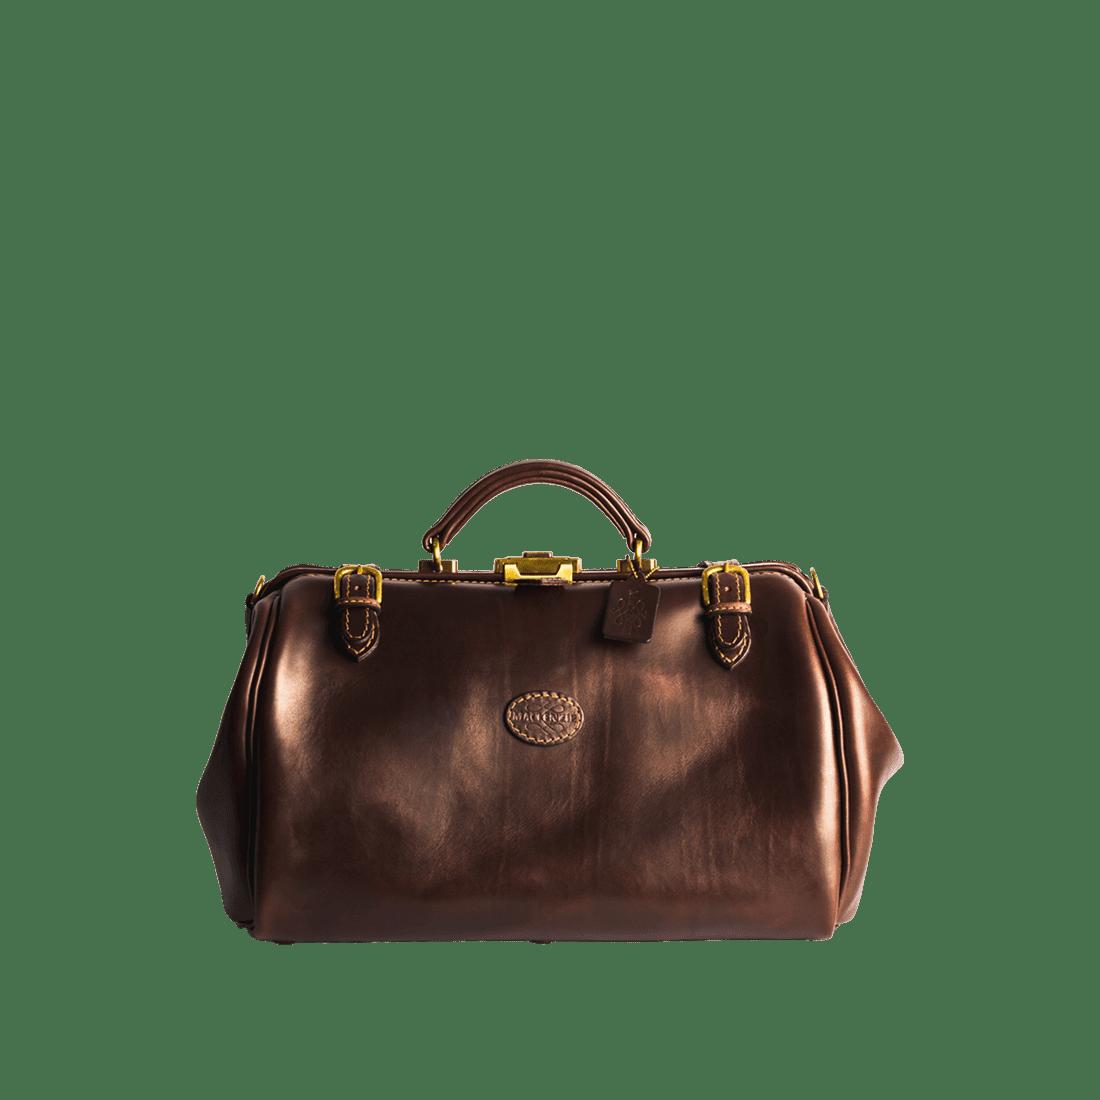 MacKenzie Leather - gladstone bag